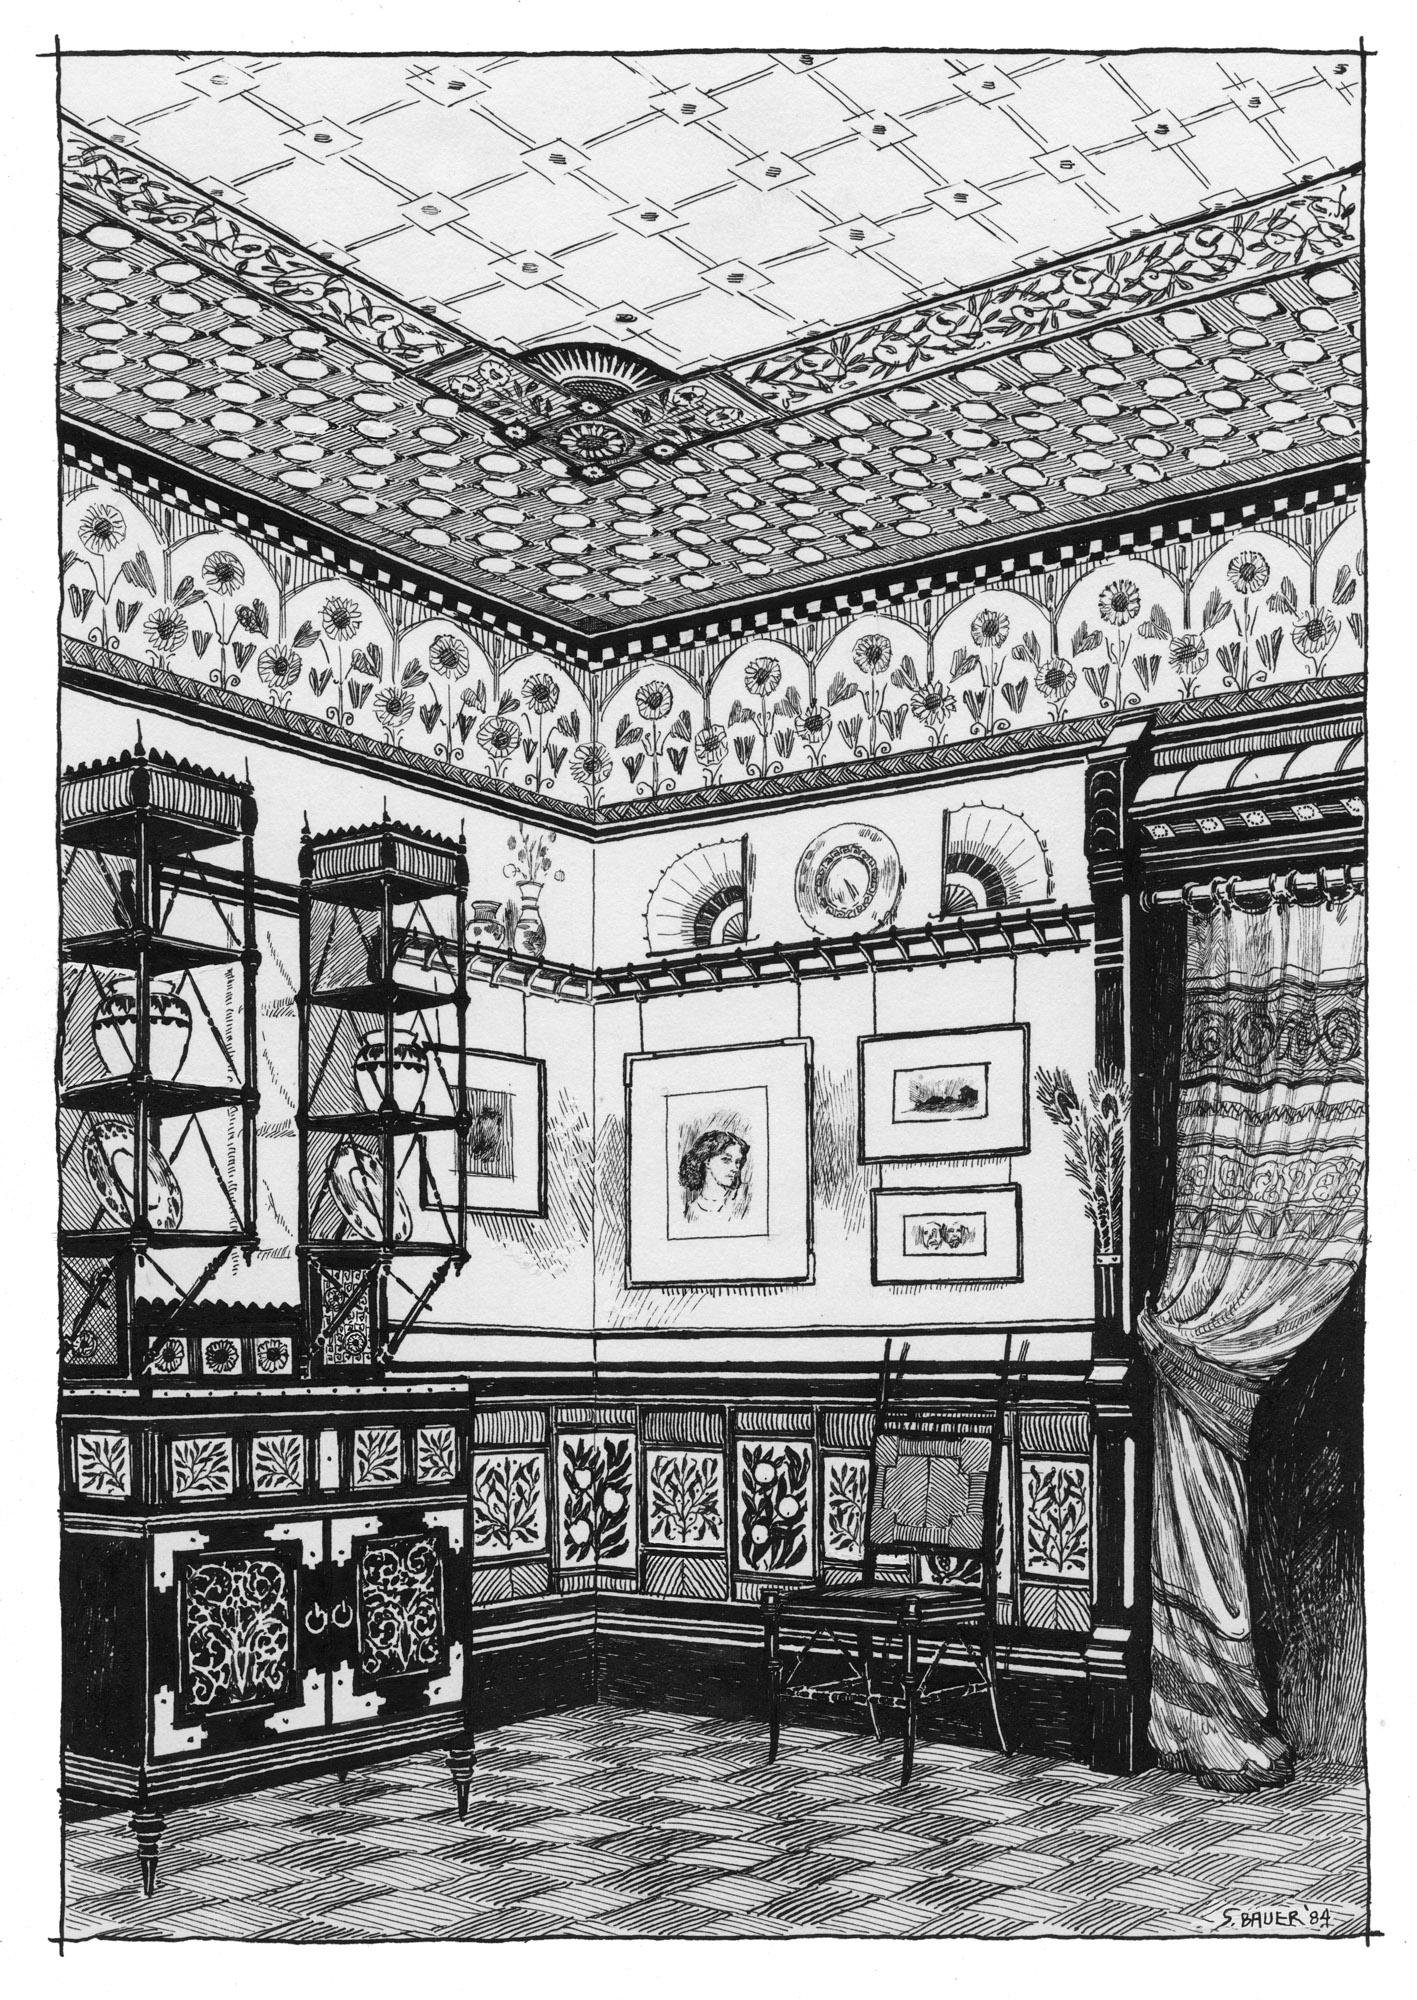 Aesthetic Movement Interiors 1872–1889